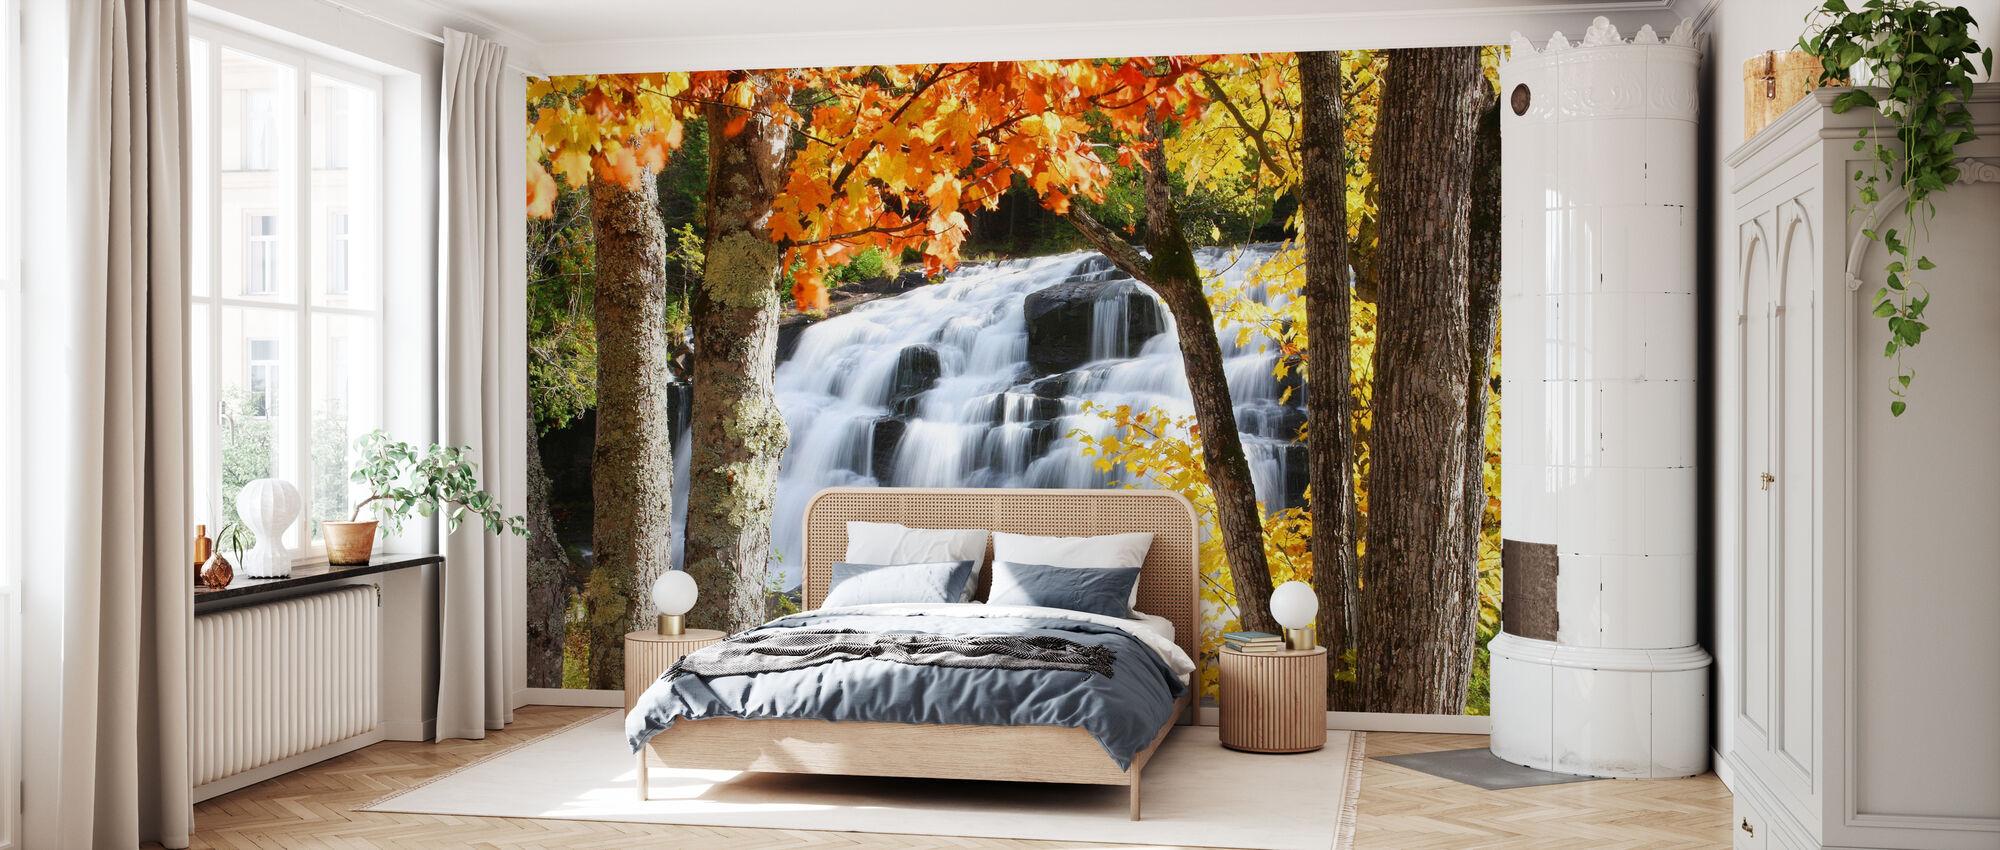 Bond Falls dressed in Autumn colors - Wallpaper - Bedroom